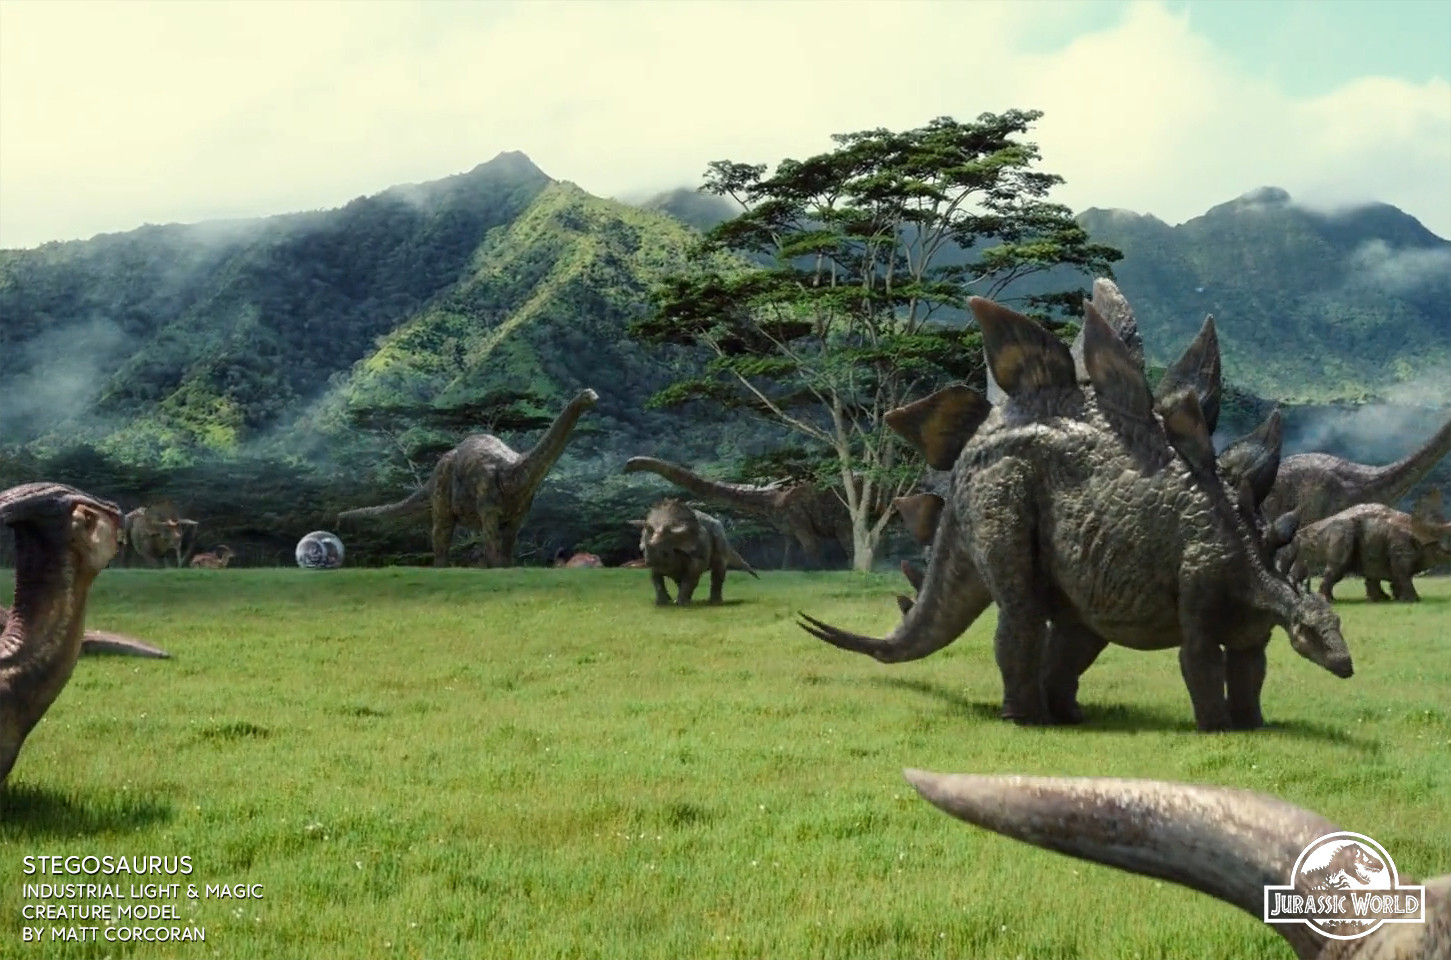 Matt corcoran jurassicworld stegosaurs 02